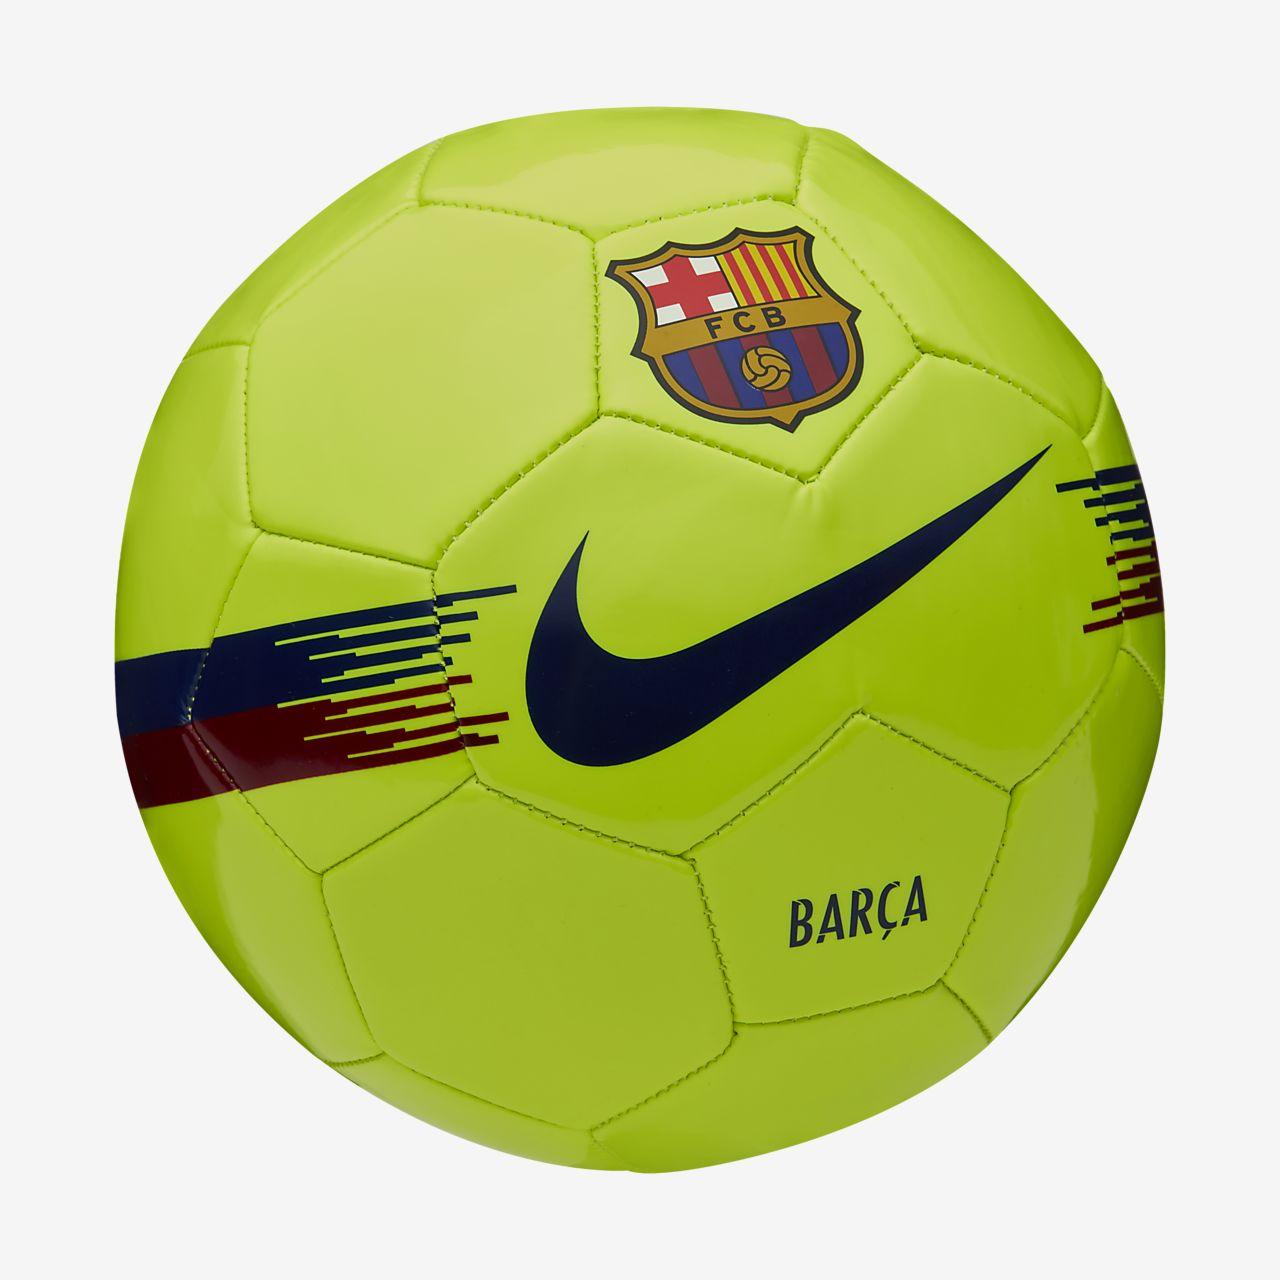 Ballon de football FC Barcelona Supporters. Nike.com FR 1c15c639a9c